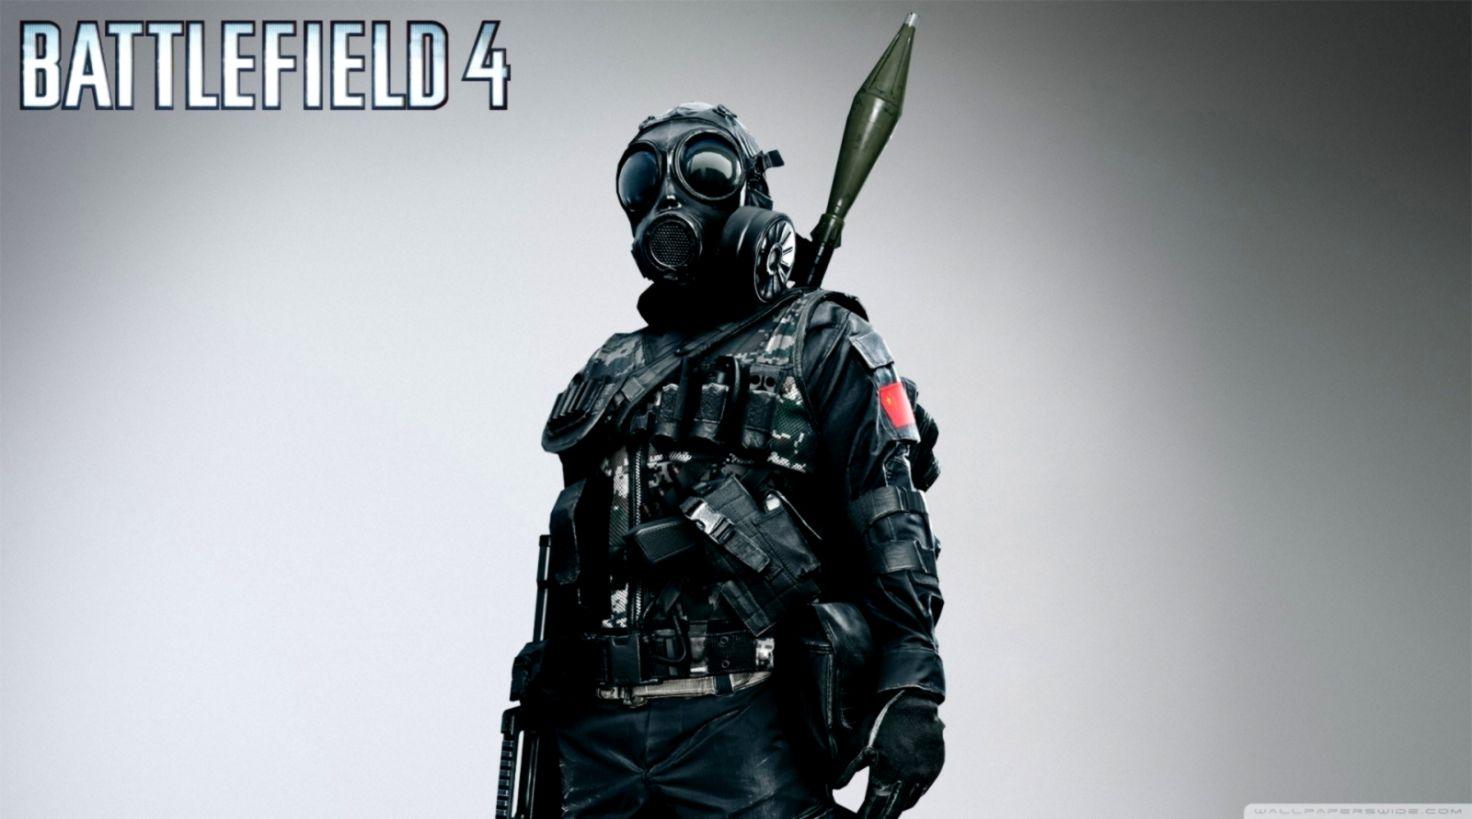 Grenaders Gas Mask Military Hd Wallpaper Mobile Wallpapers